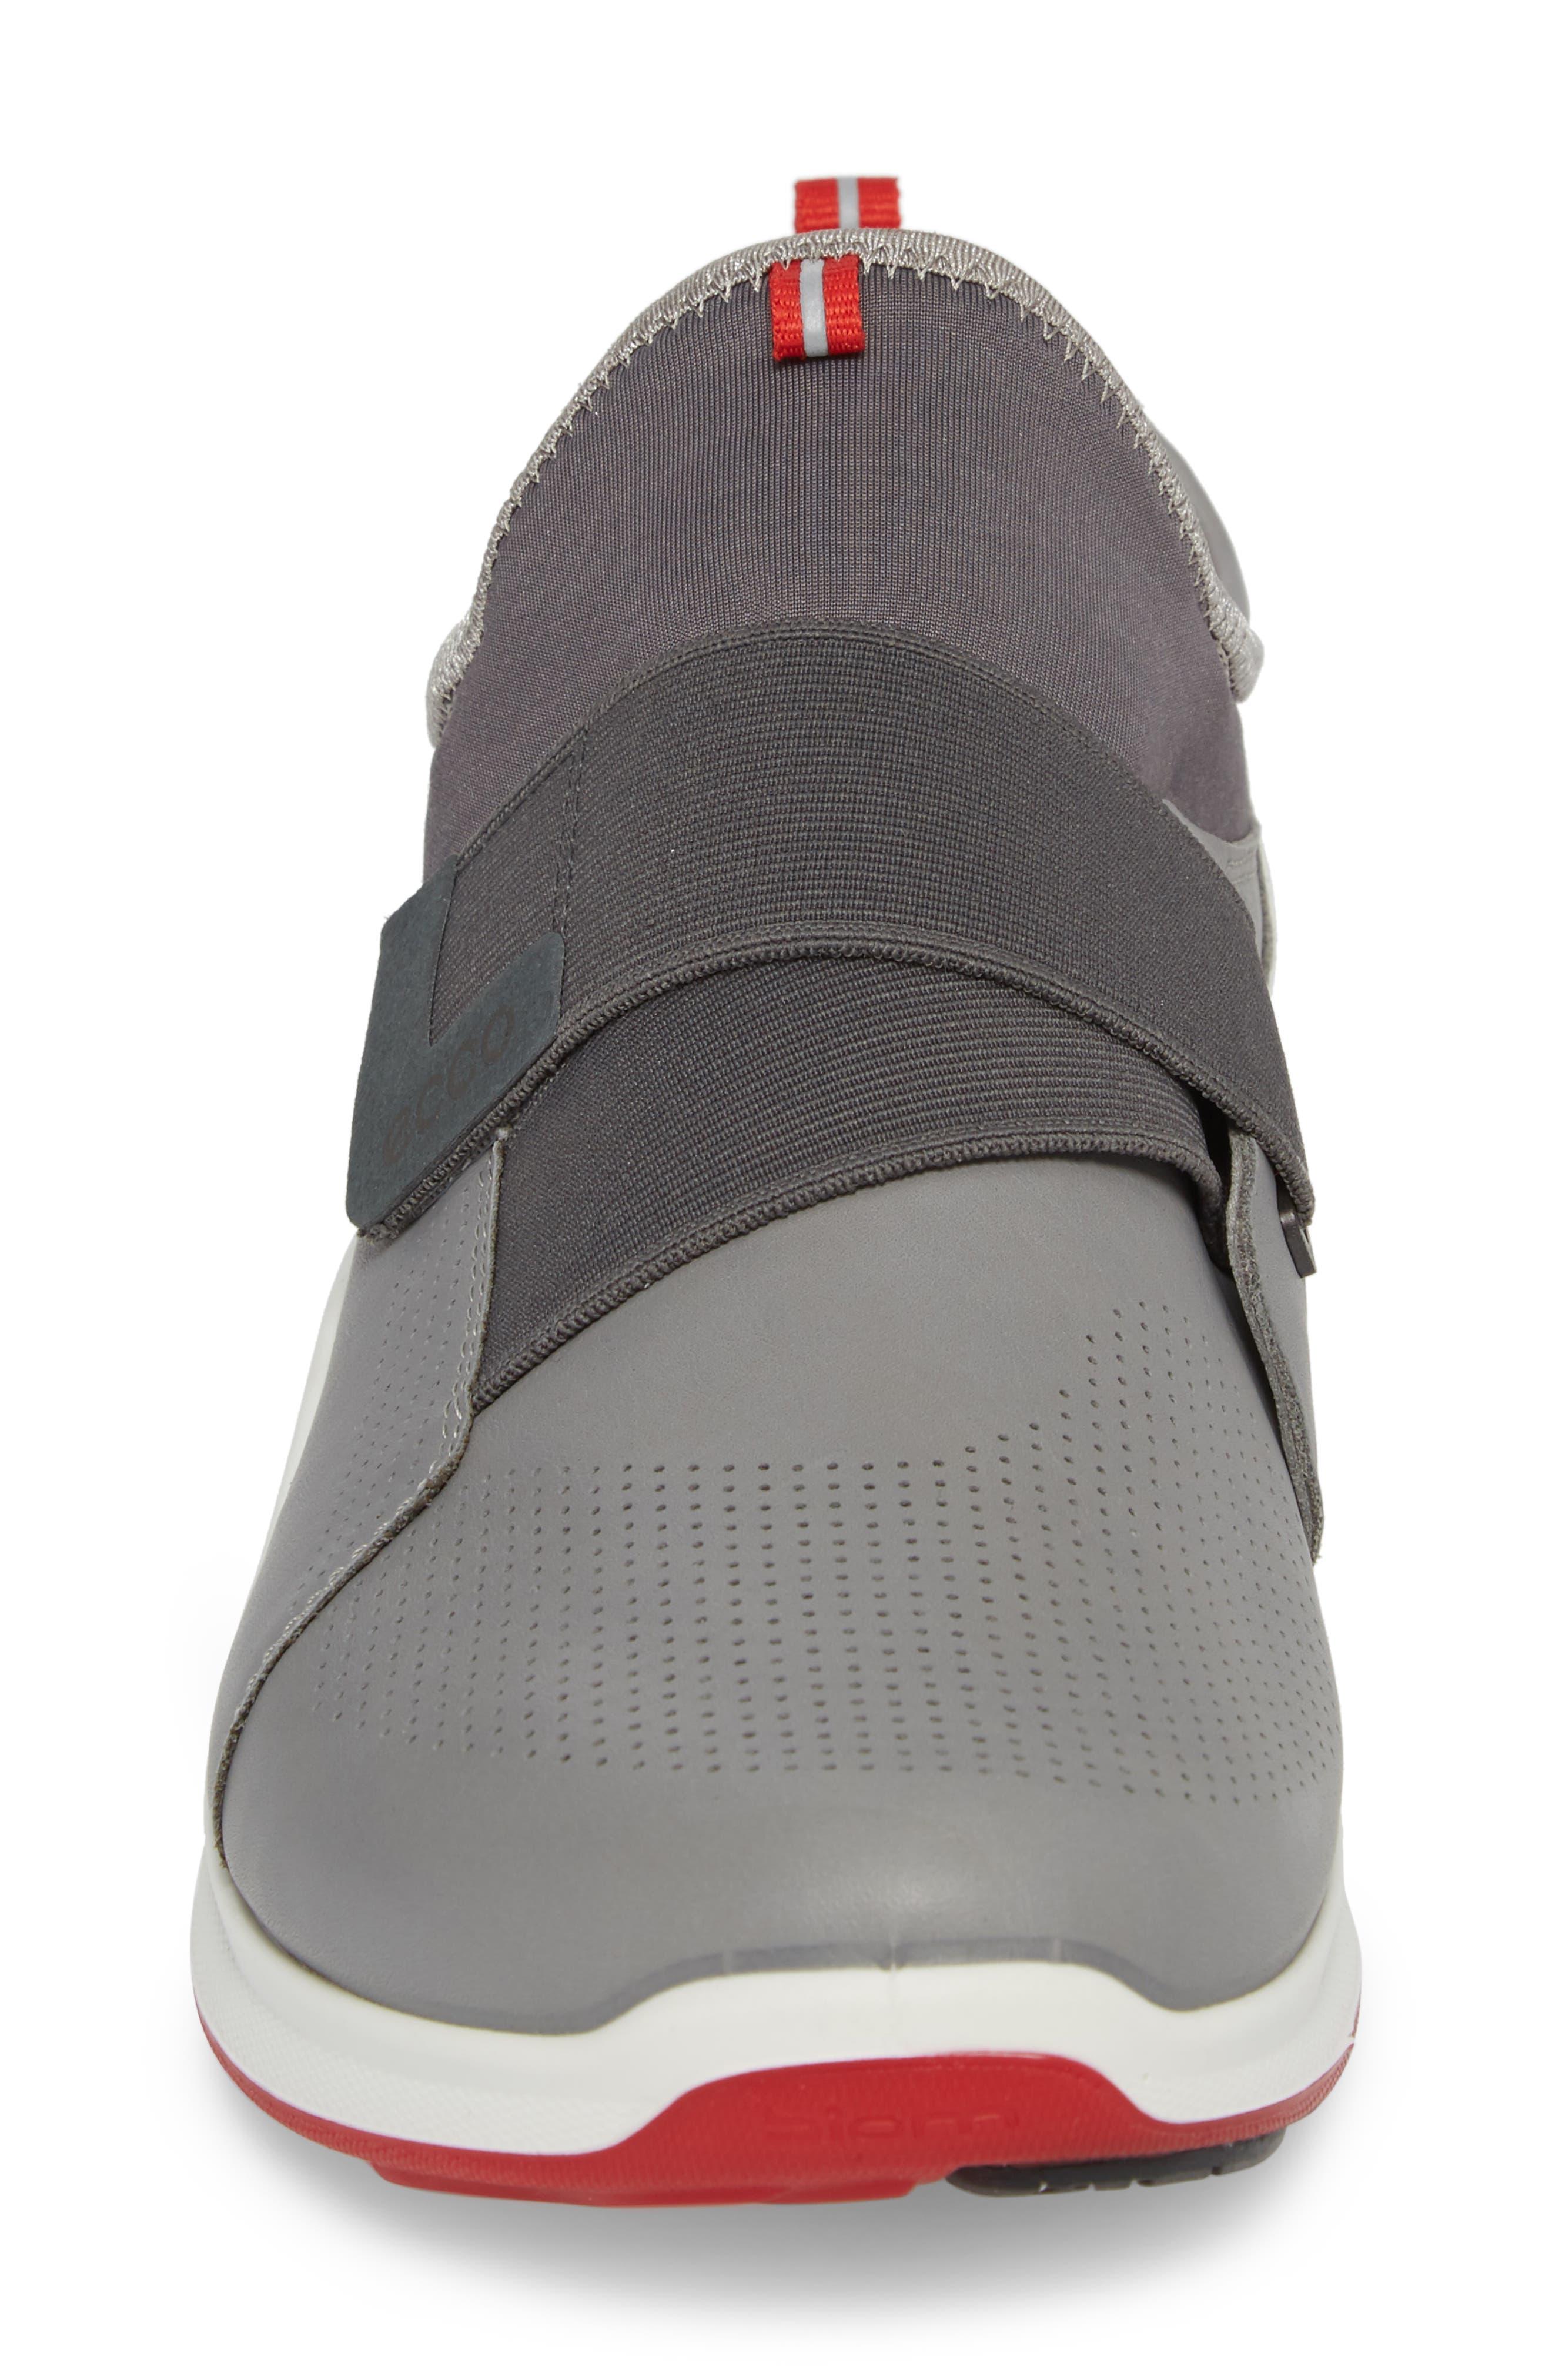 BIOM Fjuel Band Sneaker,                             Alternate thumbnail 4, color,                             Dark Shadow/ Titanium Leather